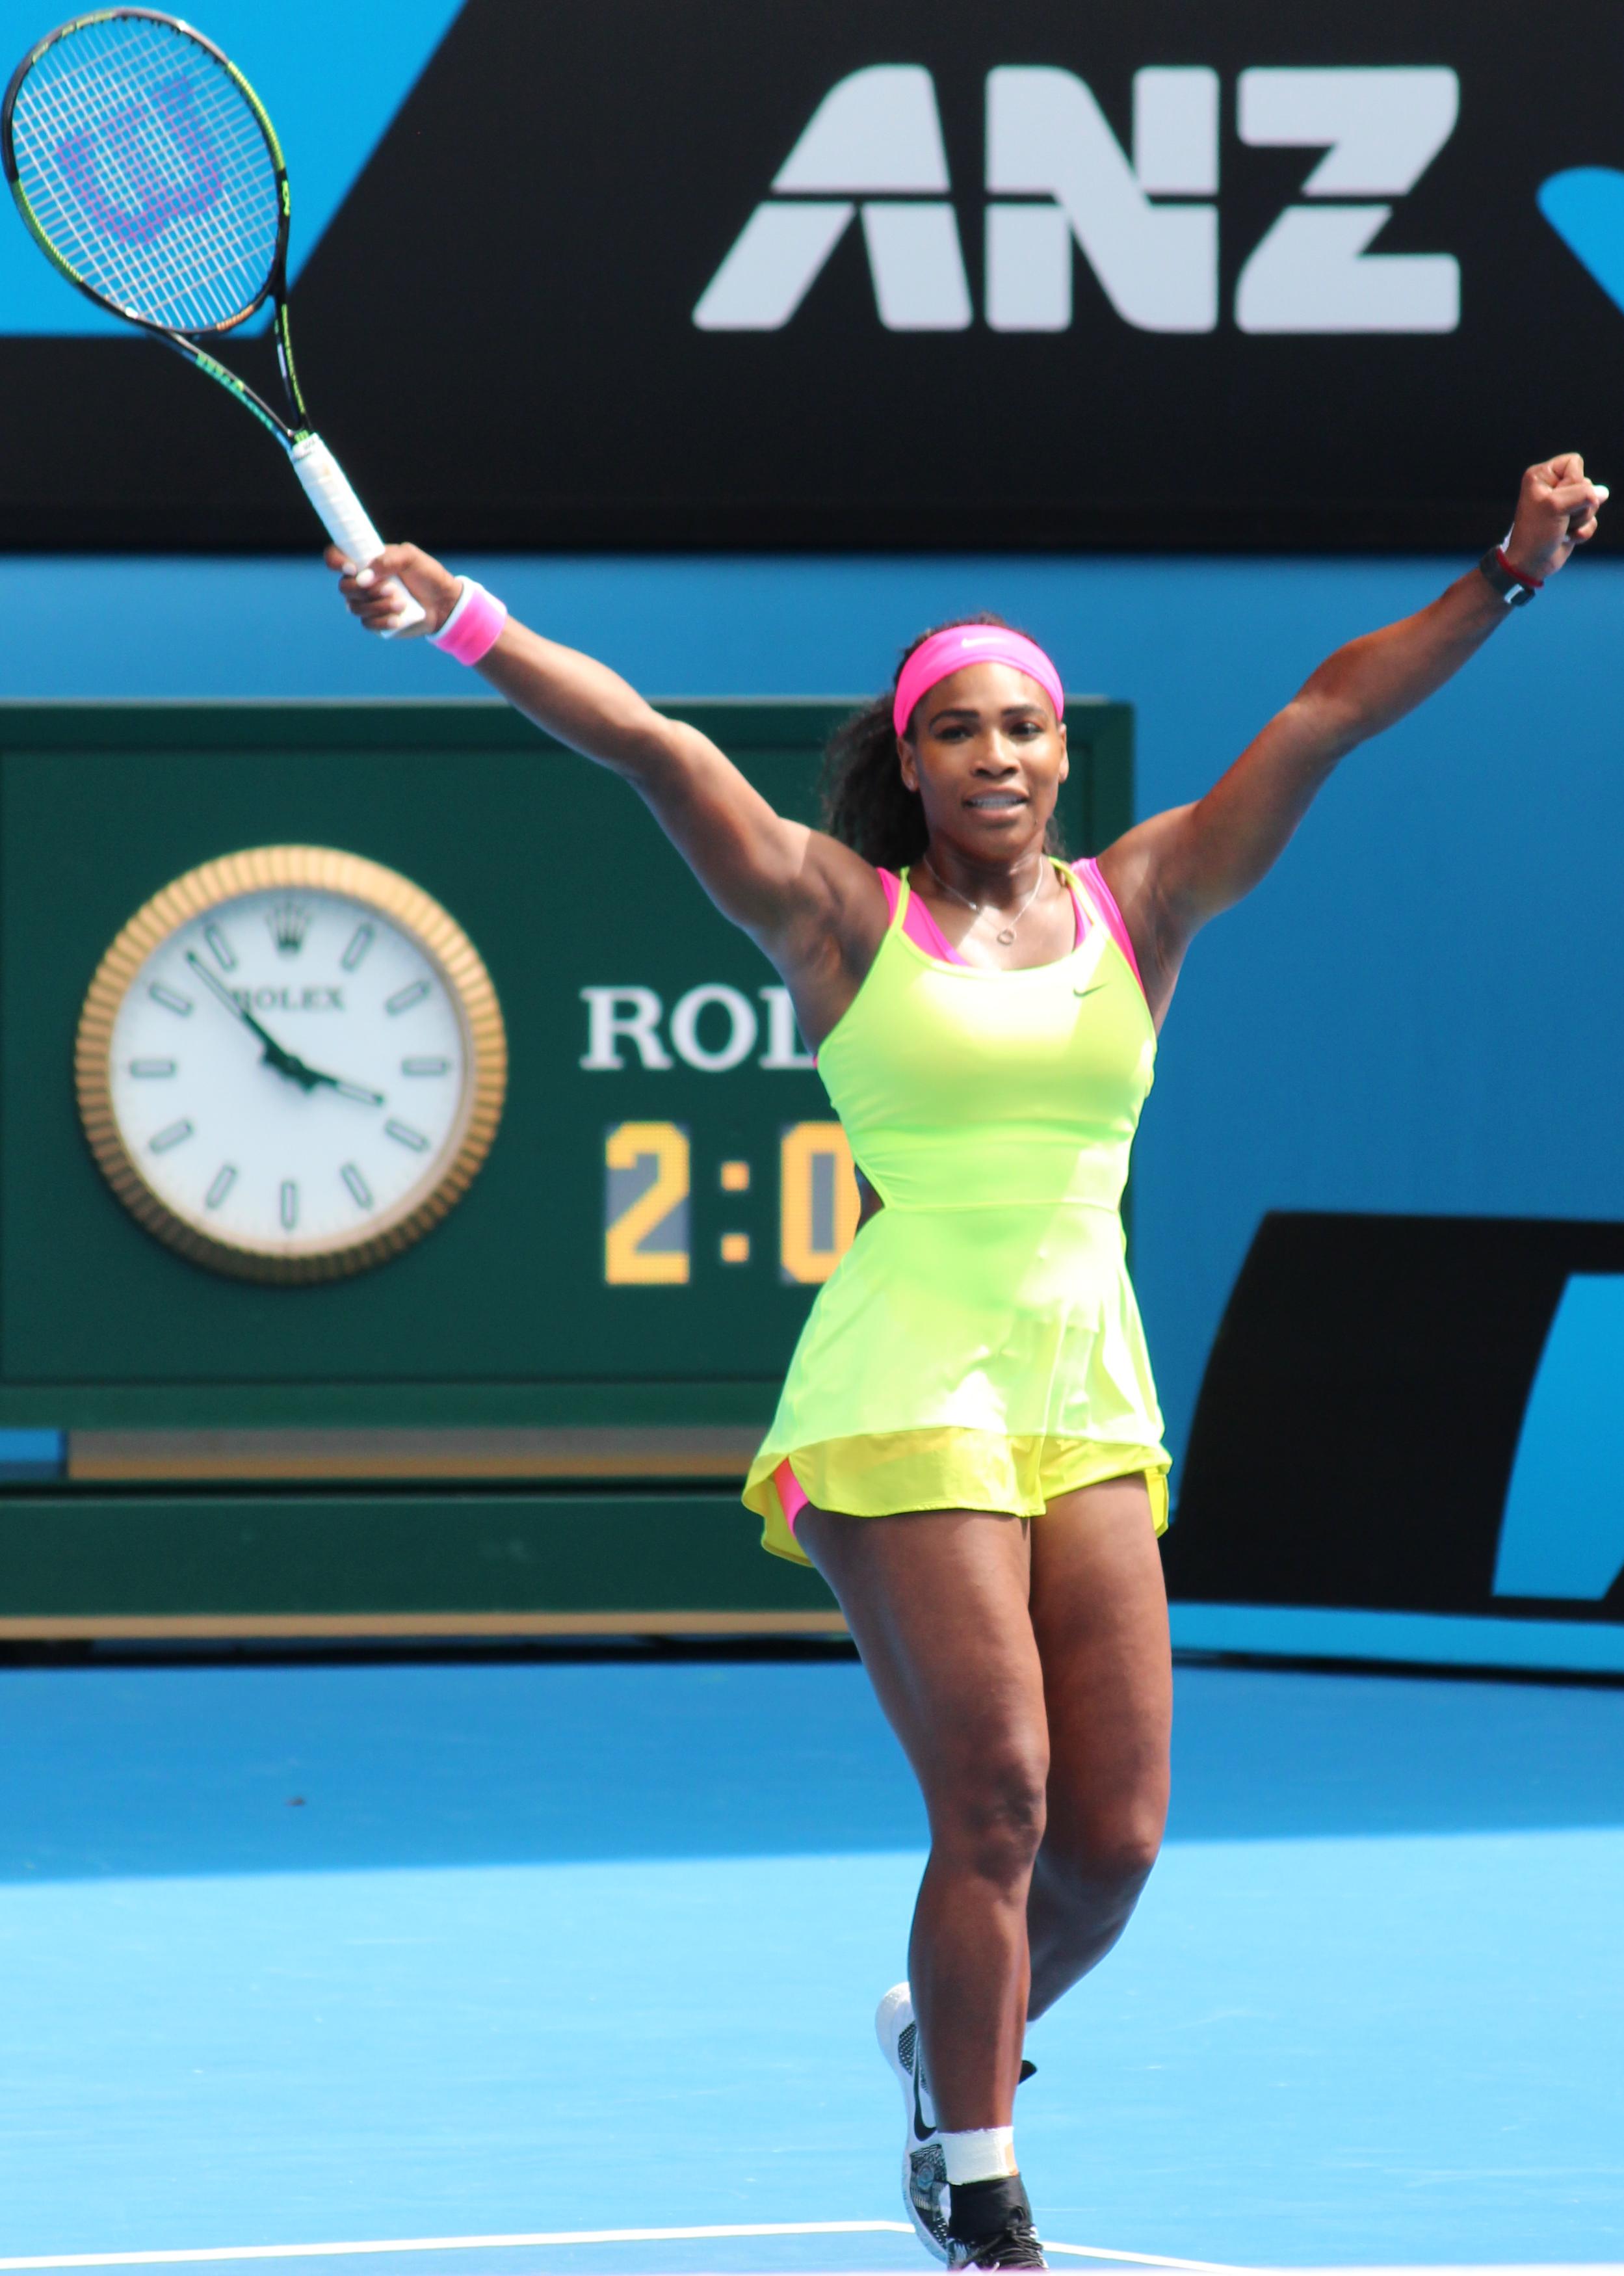 "Luma tennis challenge, <span class=""dojodigital_toggle_title"">Luma Tennis Challenge</span>"